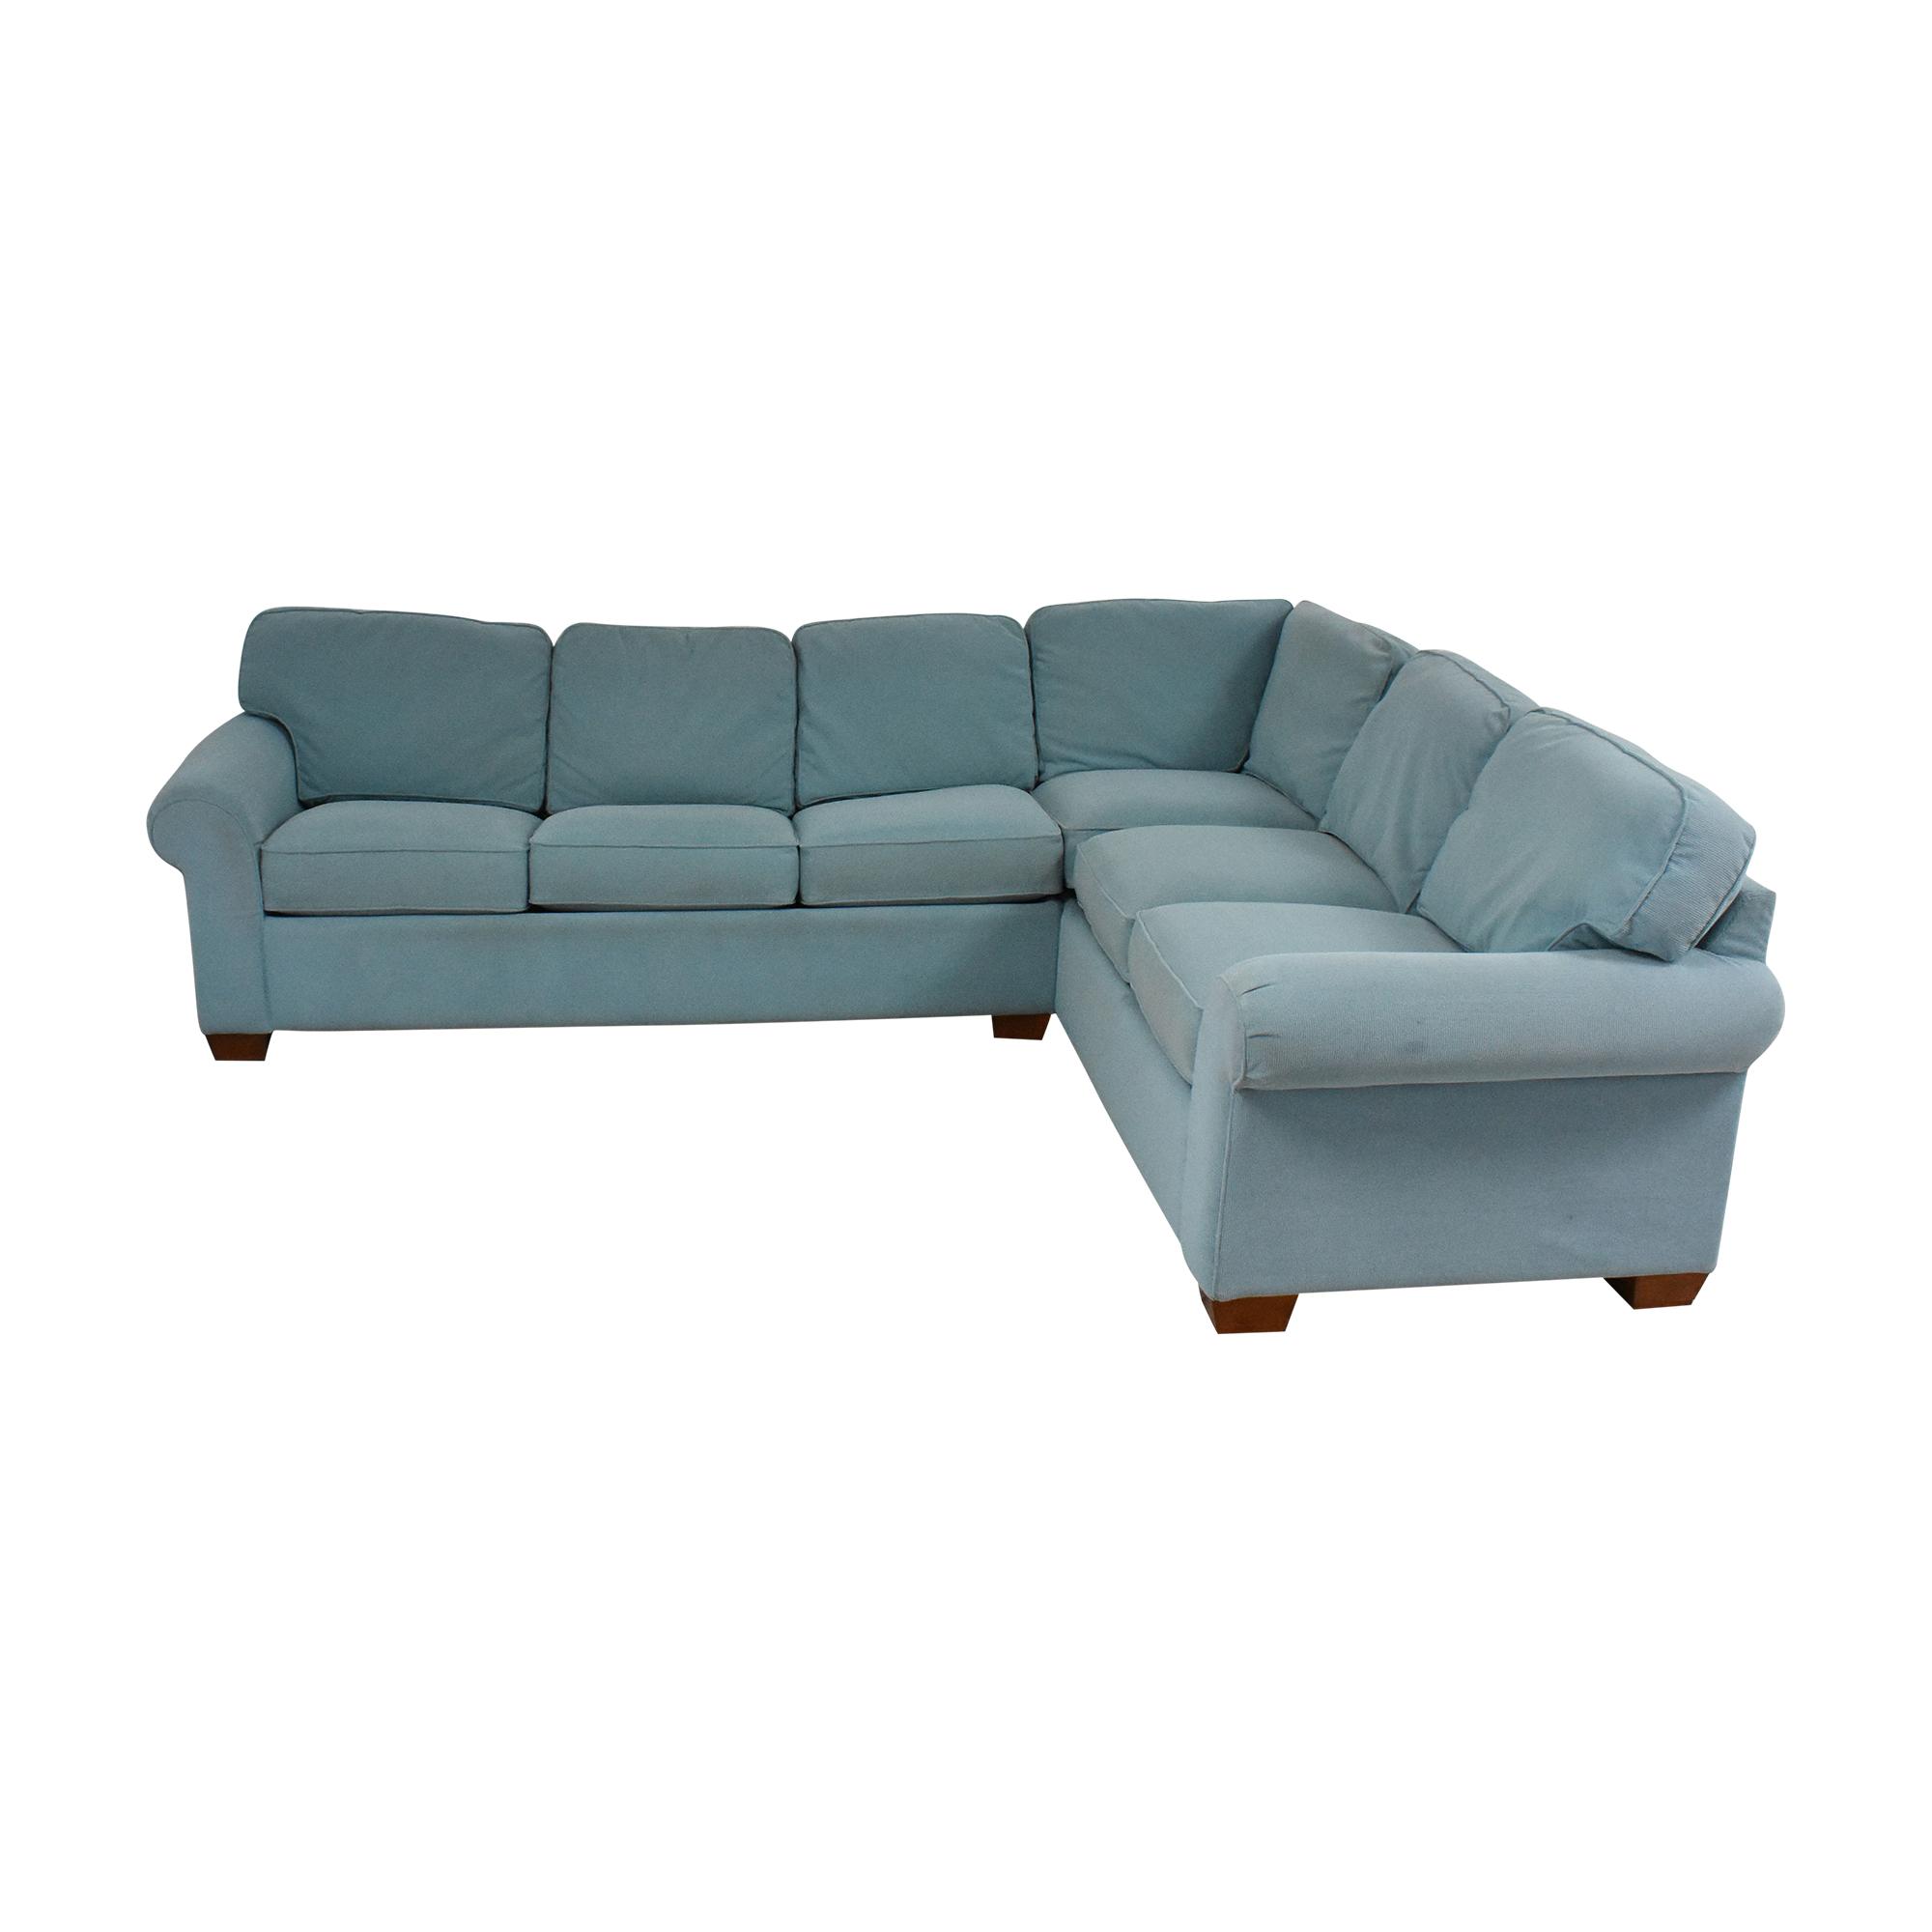 La-Z-Boy La-Z-Boy Corner Sectional Sleeper Sofa on sale